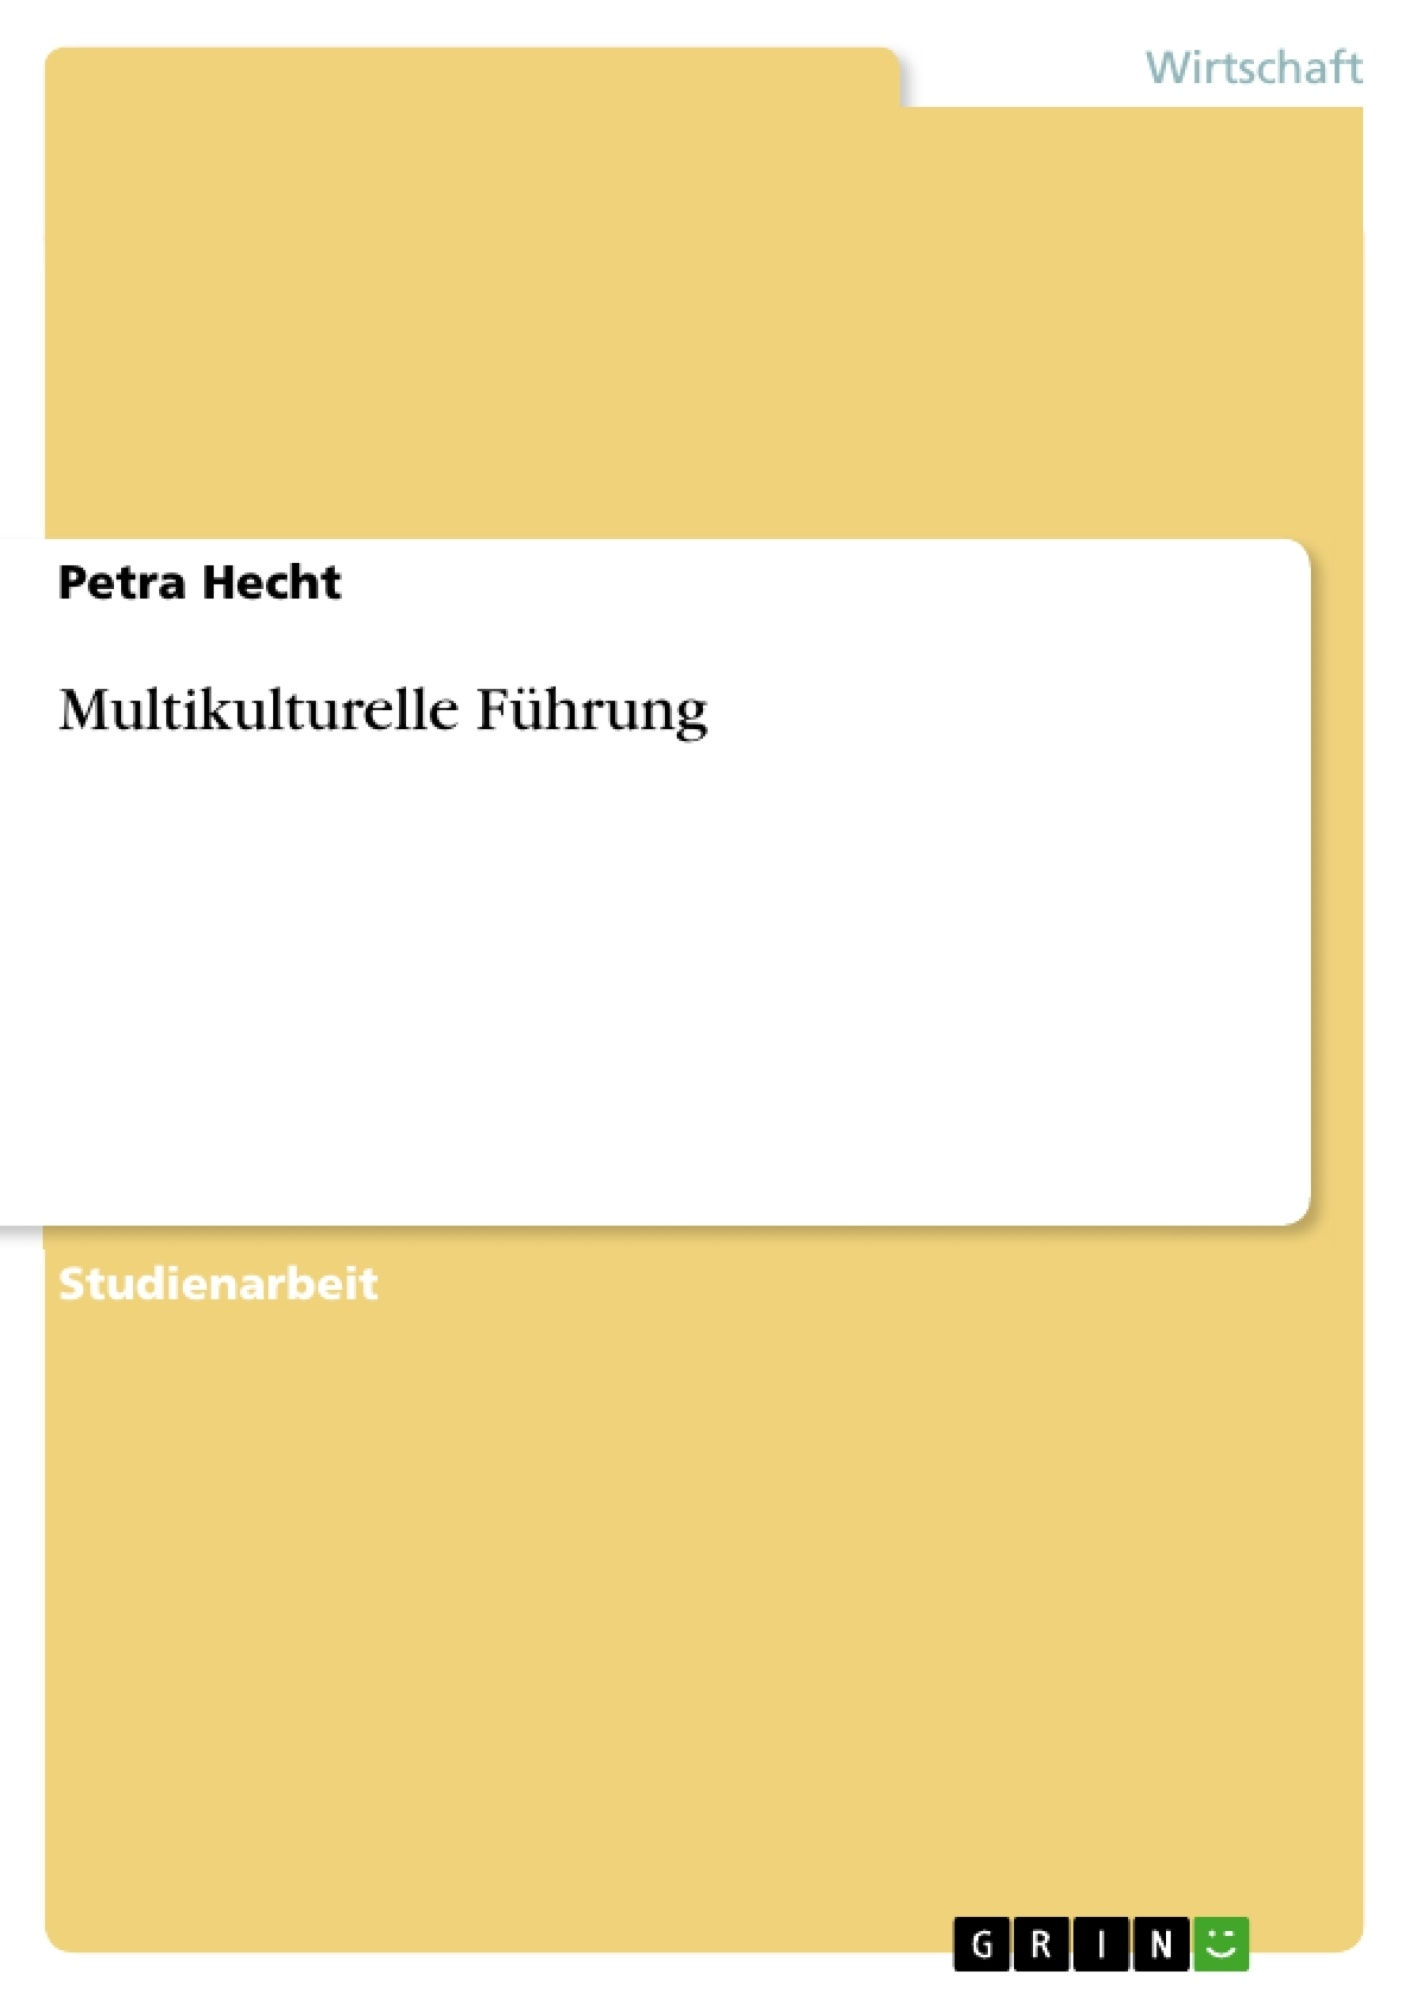 Titel: Multikulturelle Führung